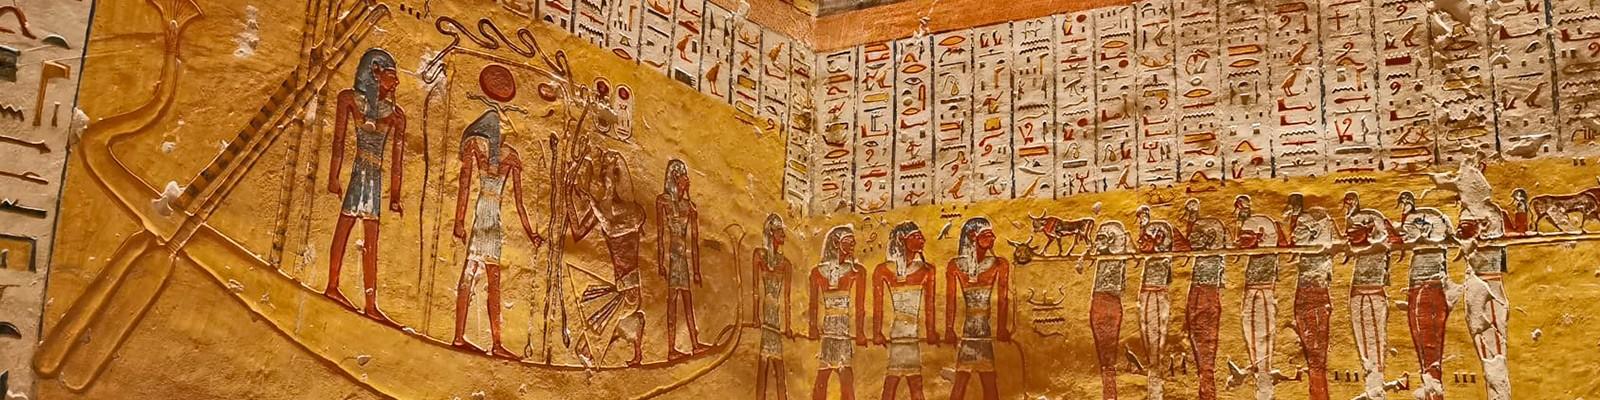 History of Luxor